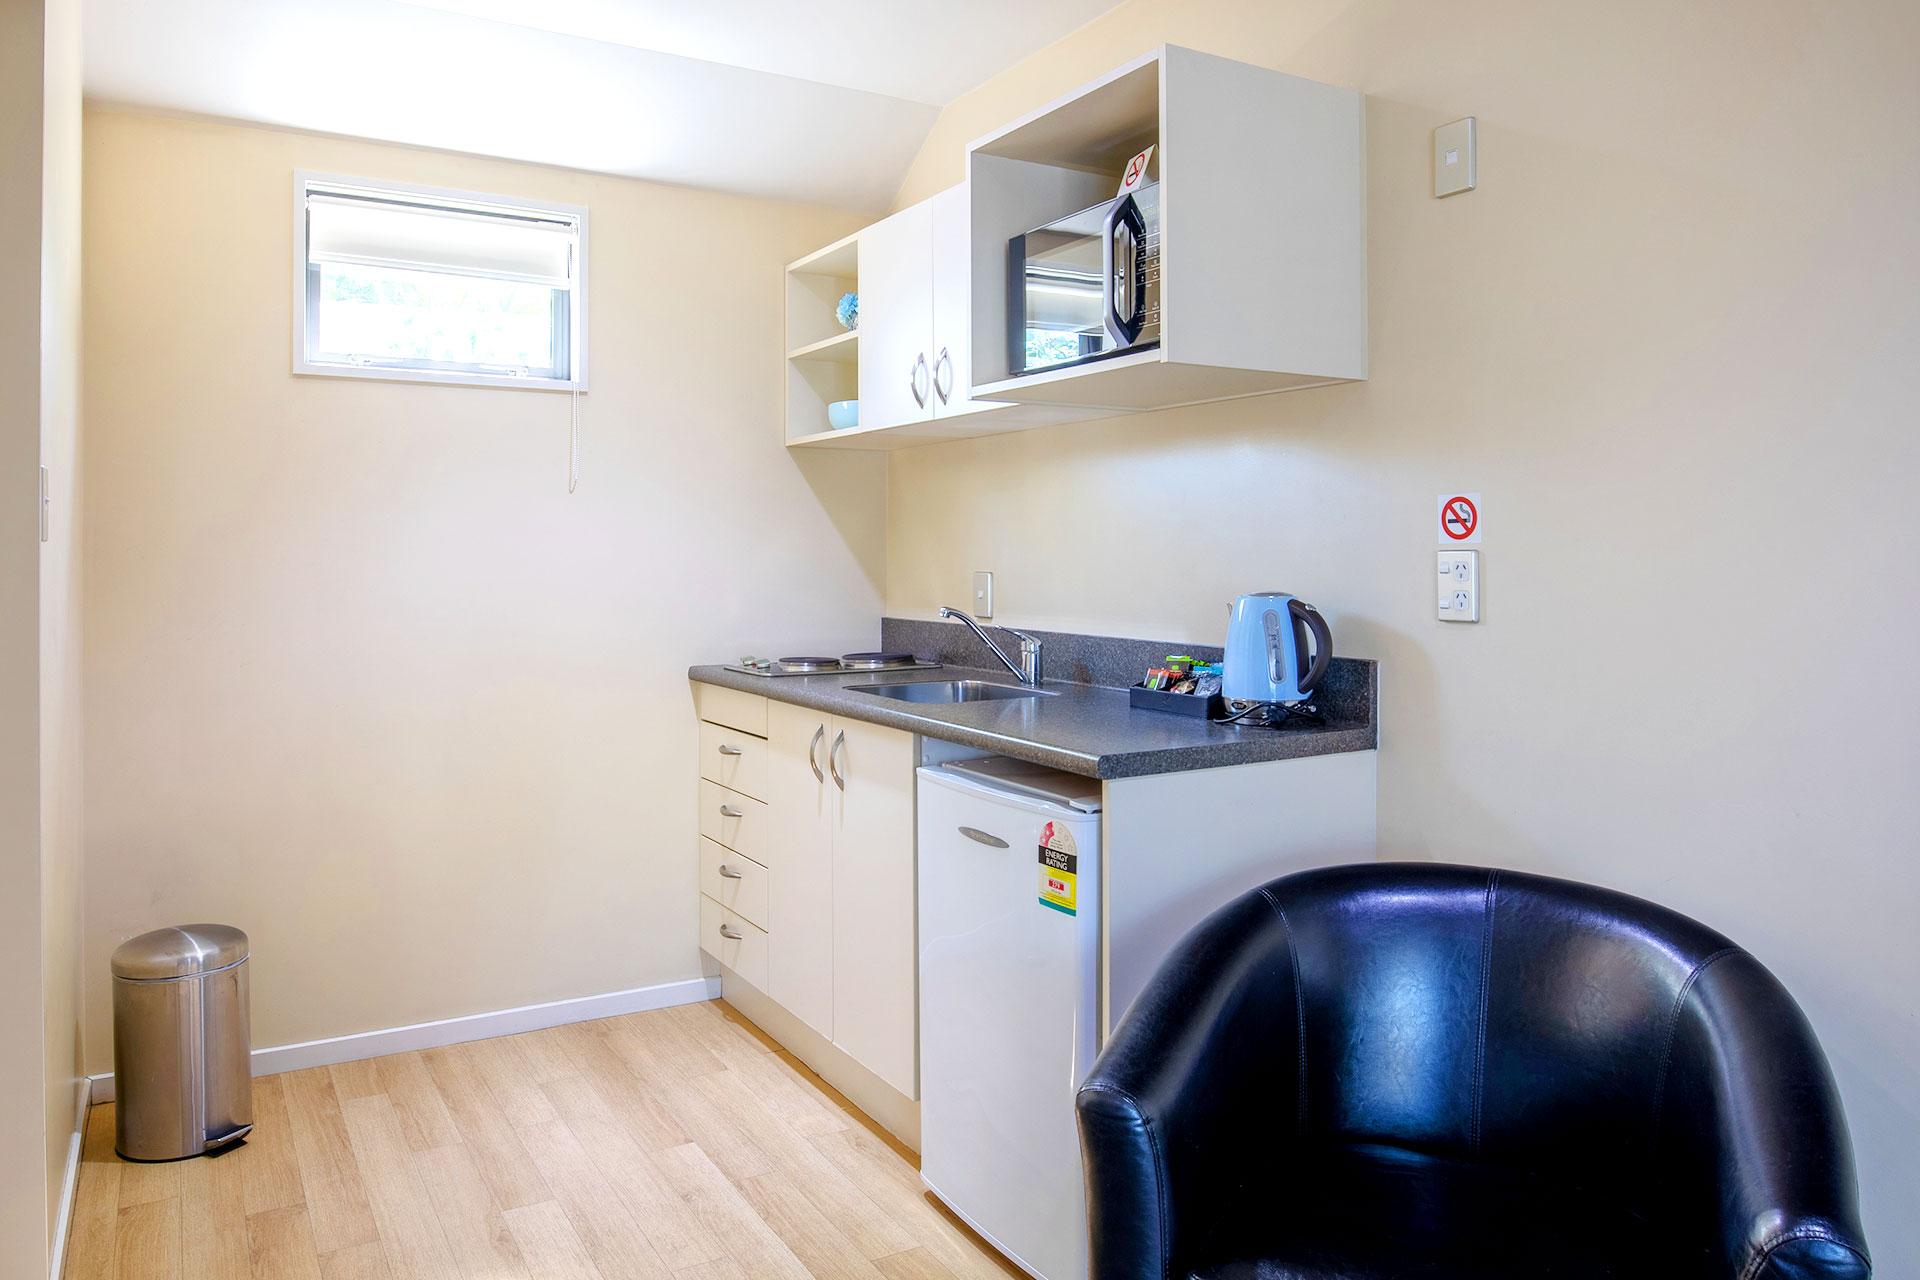 Spa_Bath_Studio_room_kitchen